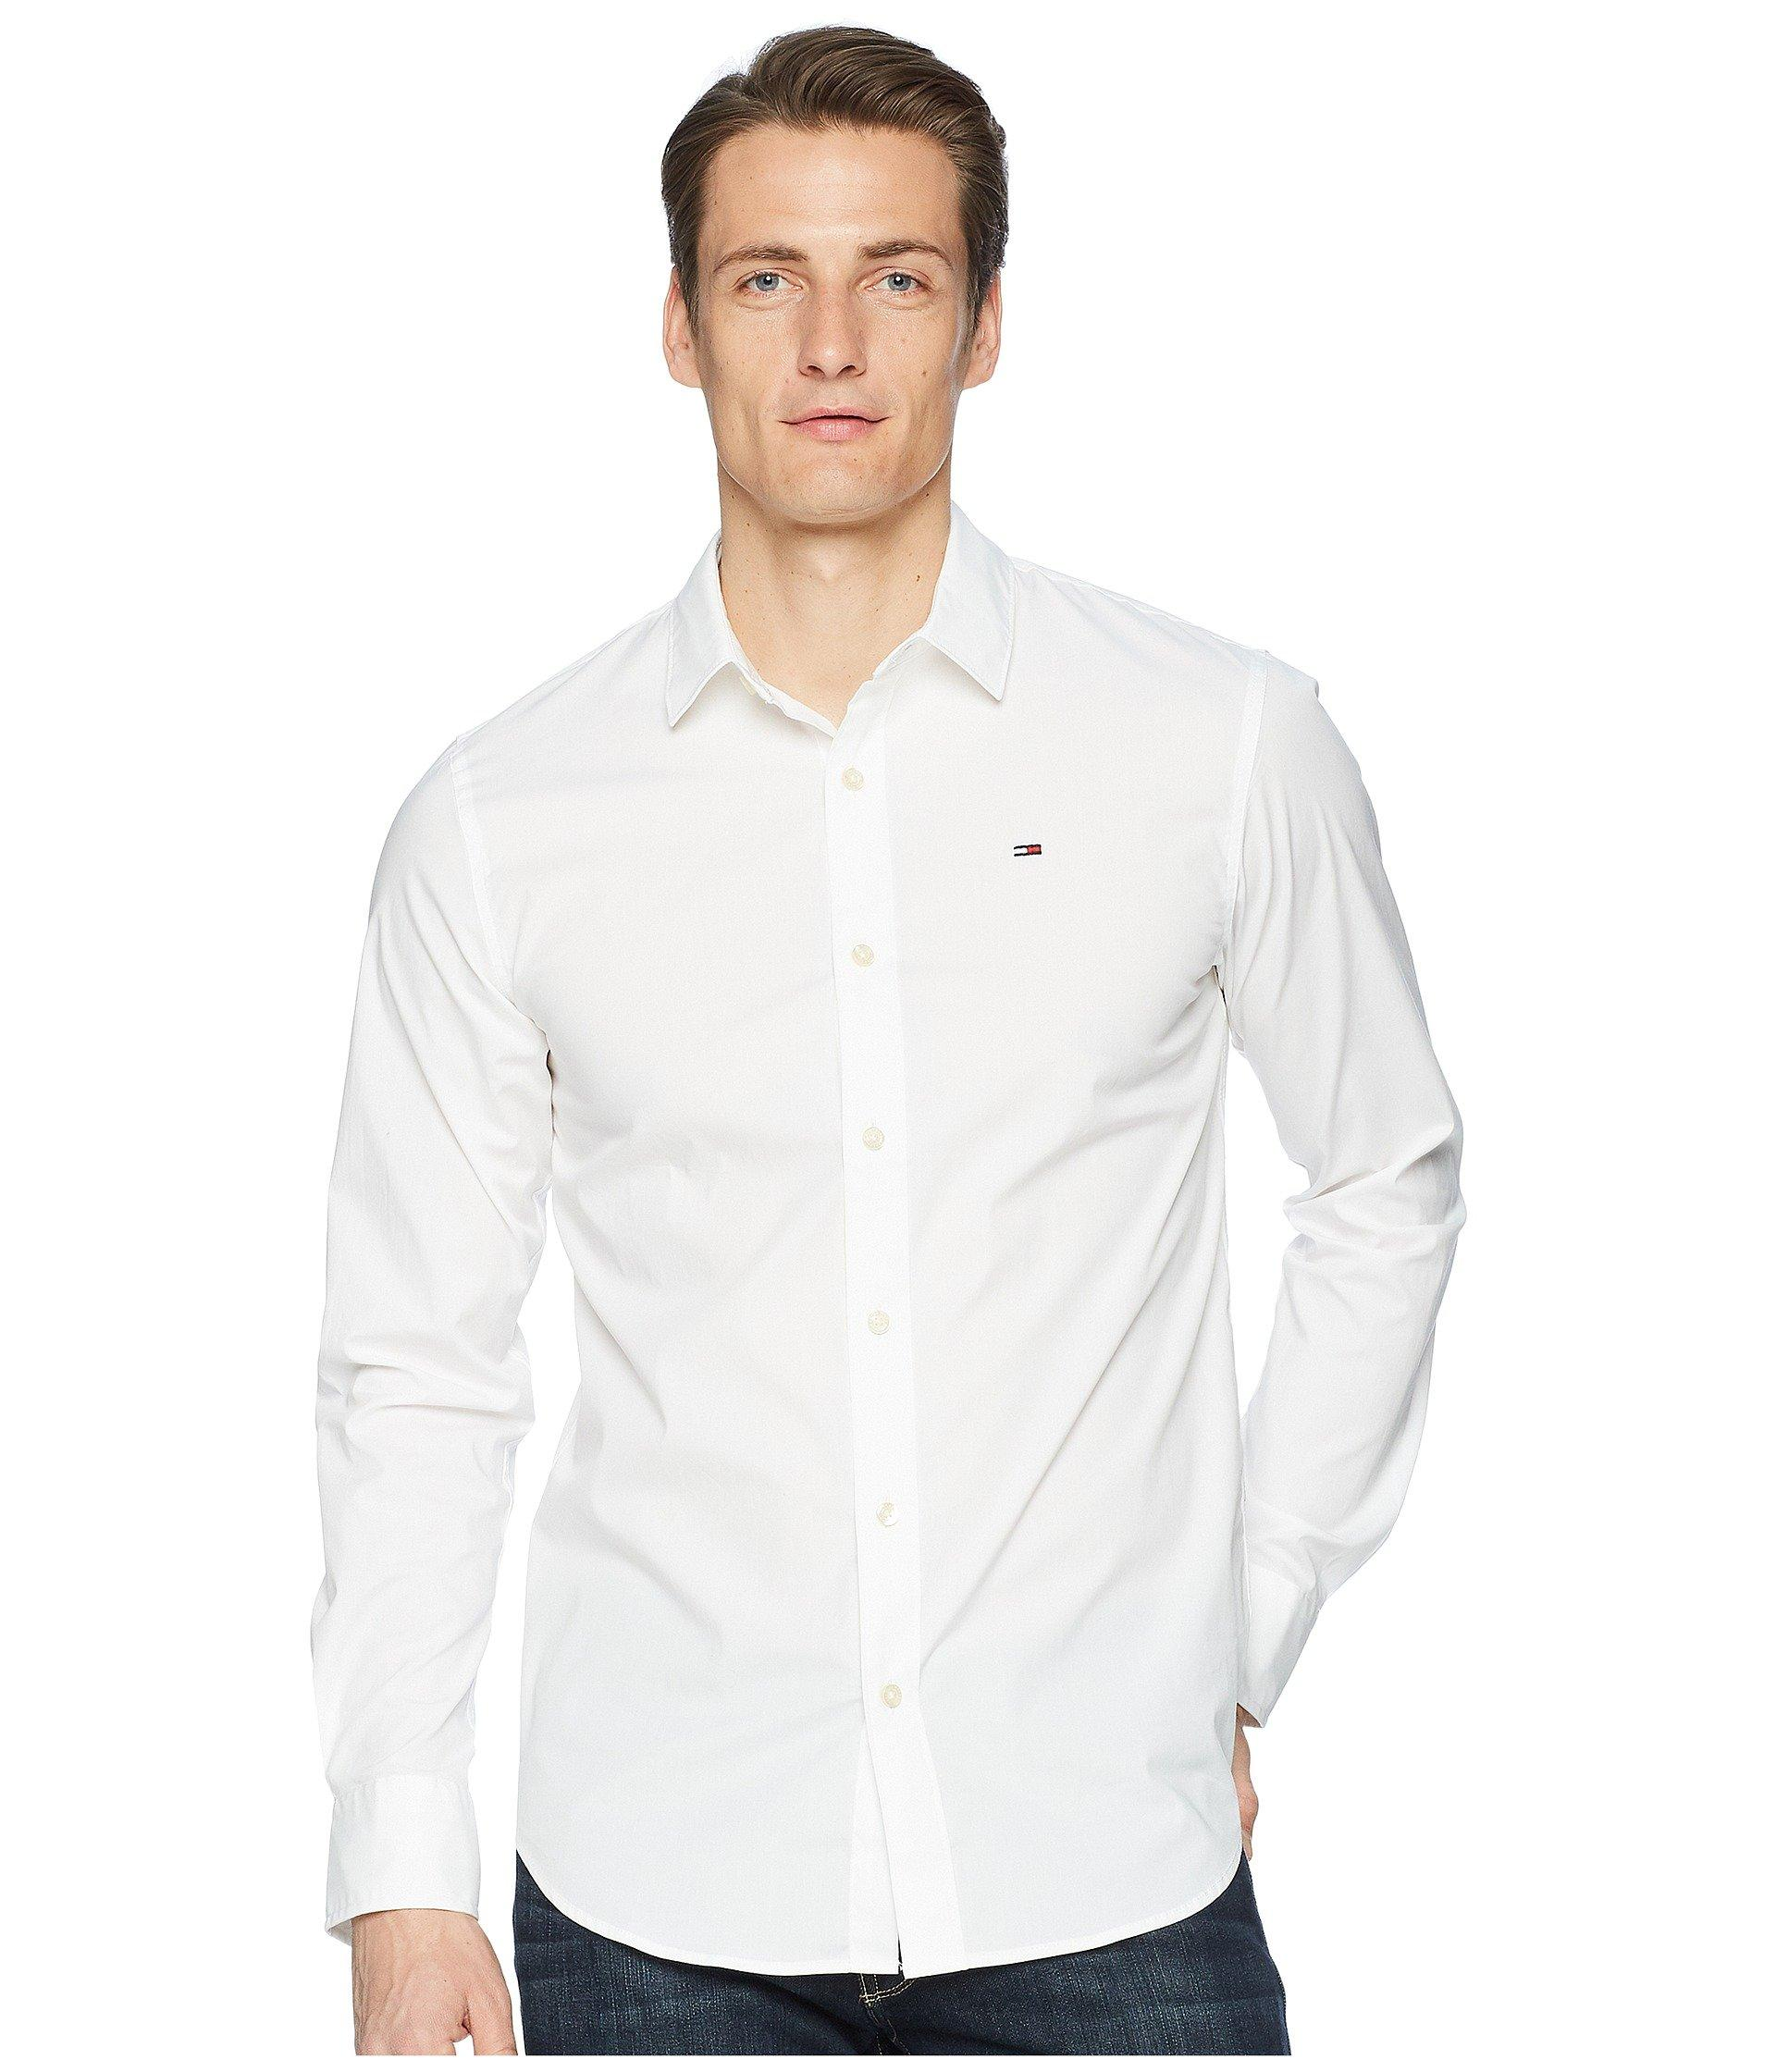 71073c9fab3 Lyst - Tommy Hilfiger Stretch Long Sleeve Button Down Shirt (black ...